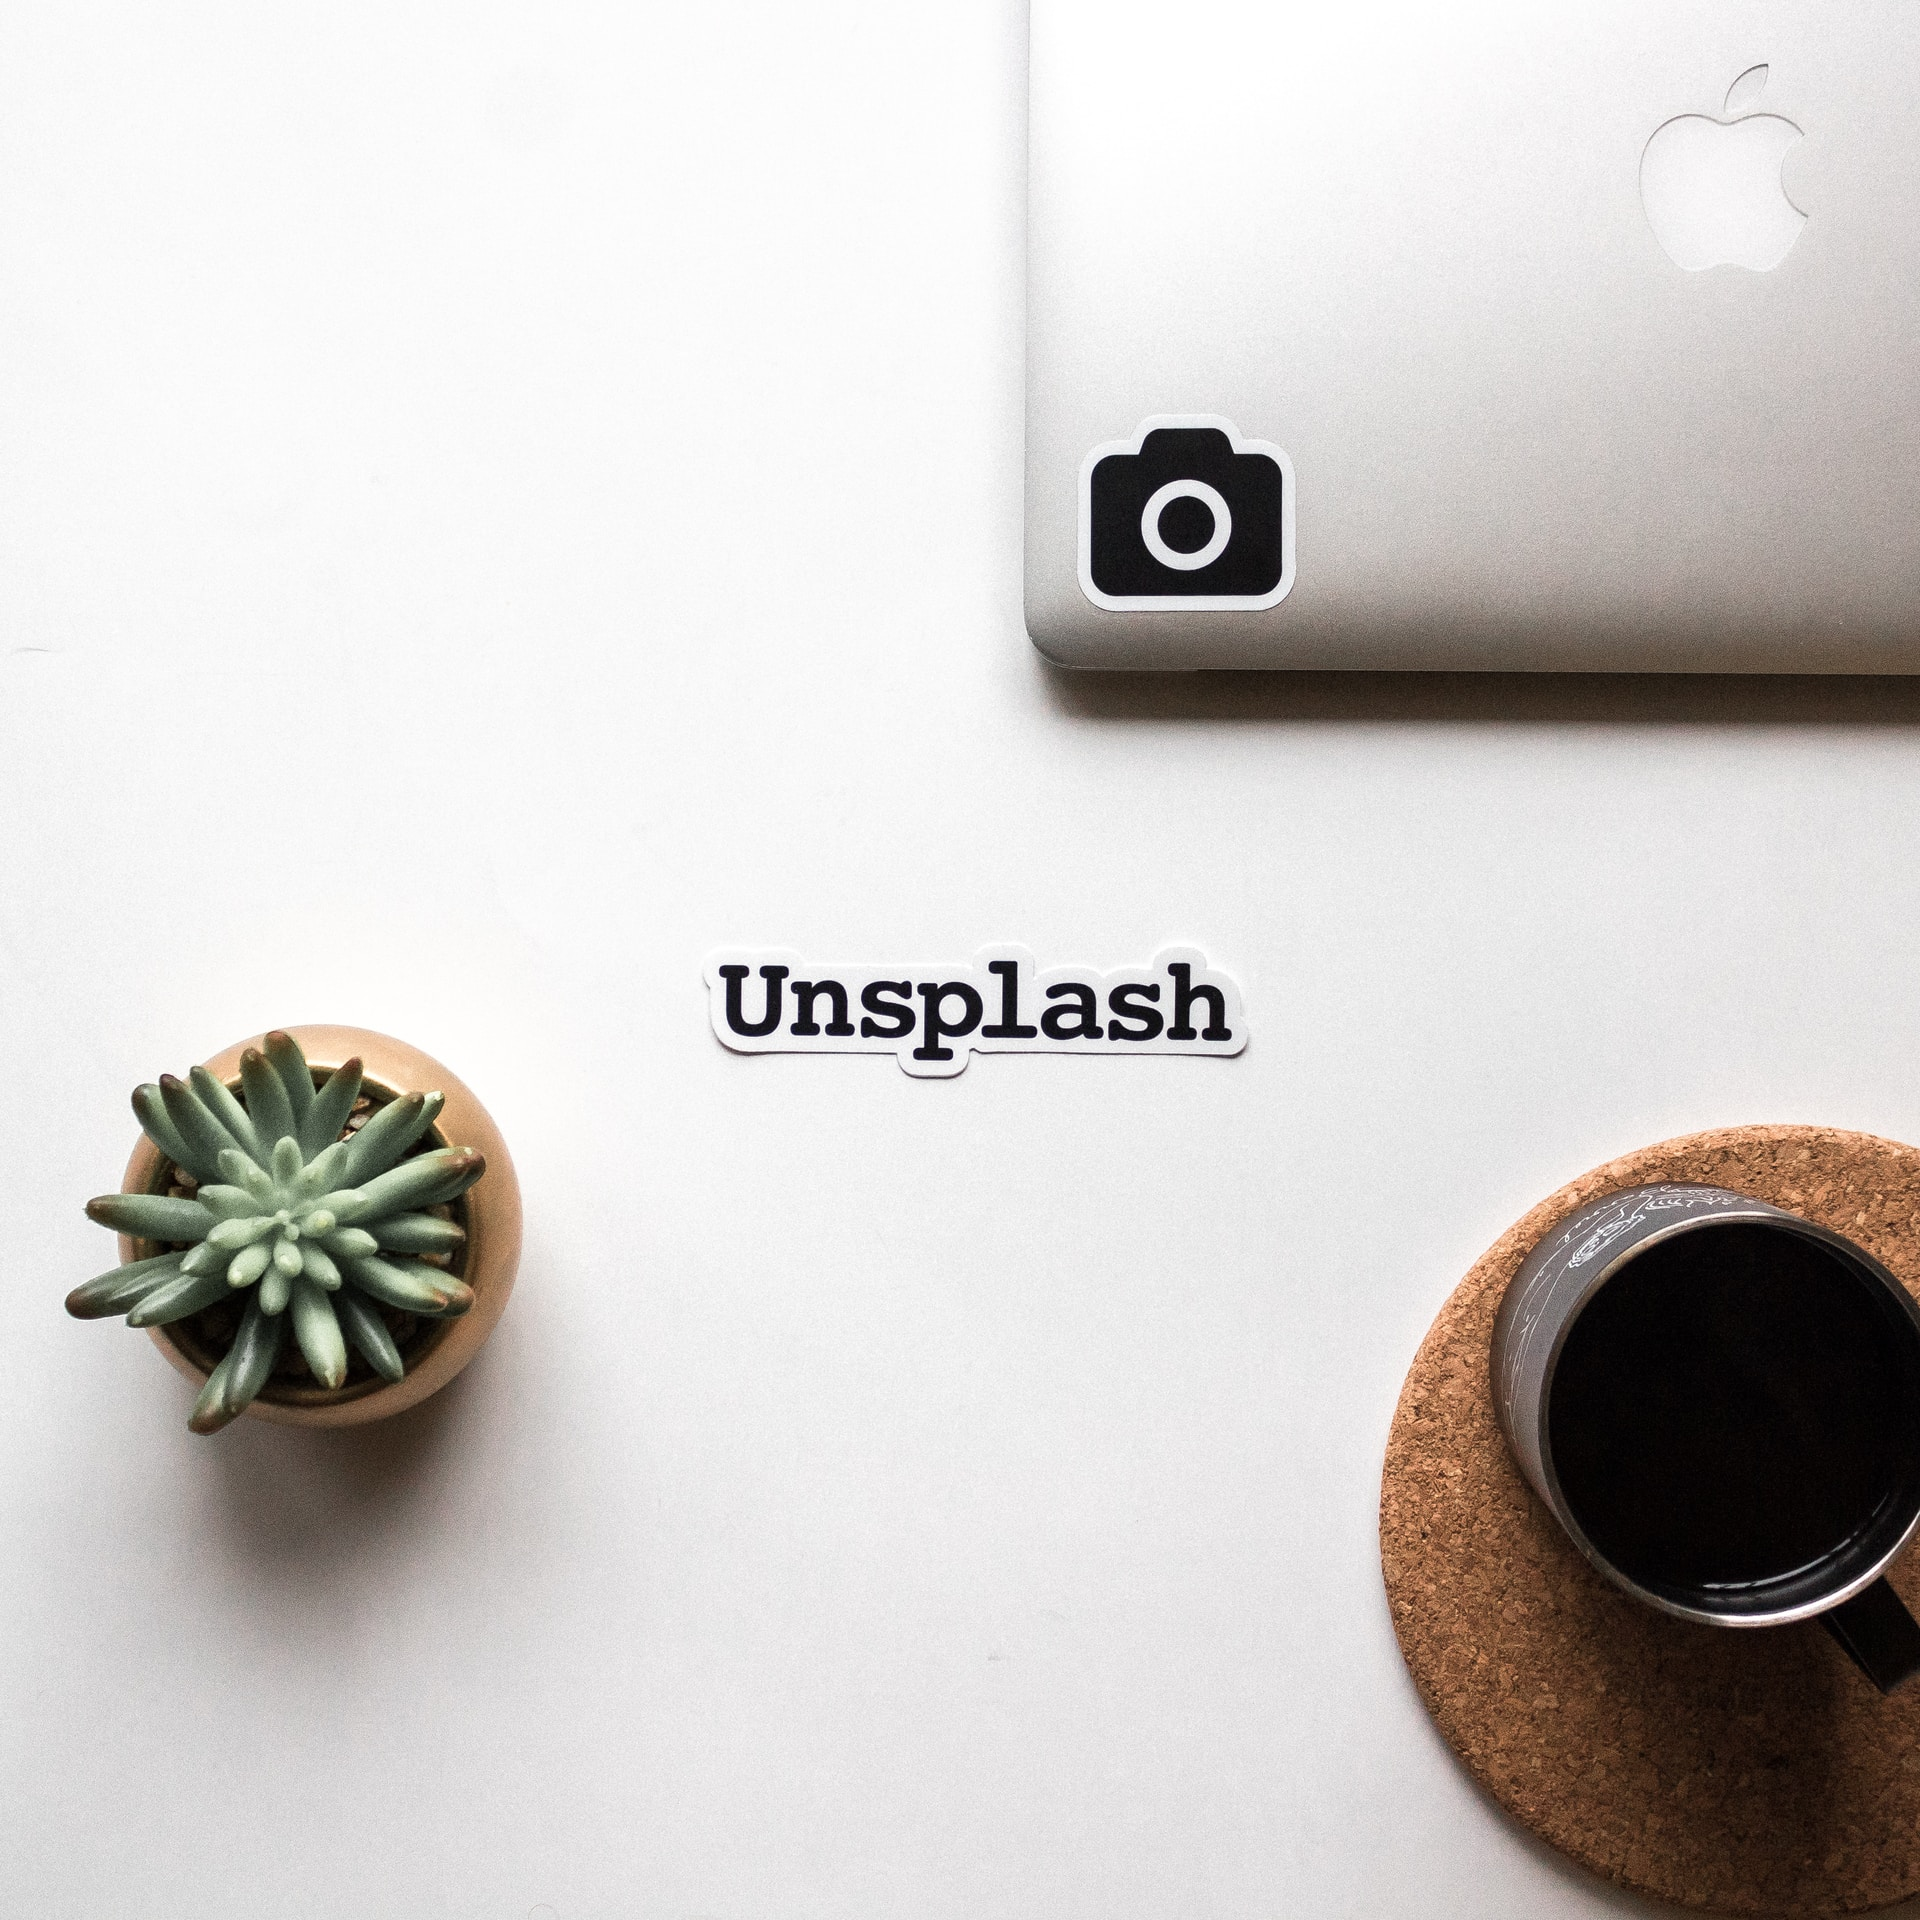 Unsplash for WordPress - Unsplash 的 WordPress 插件